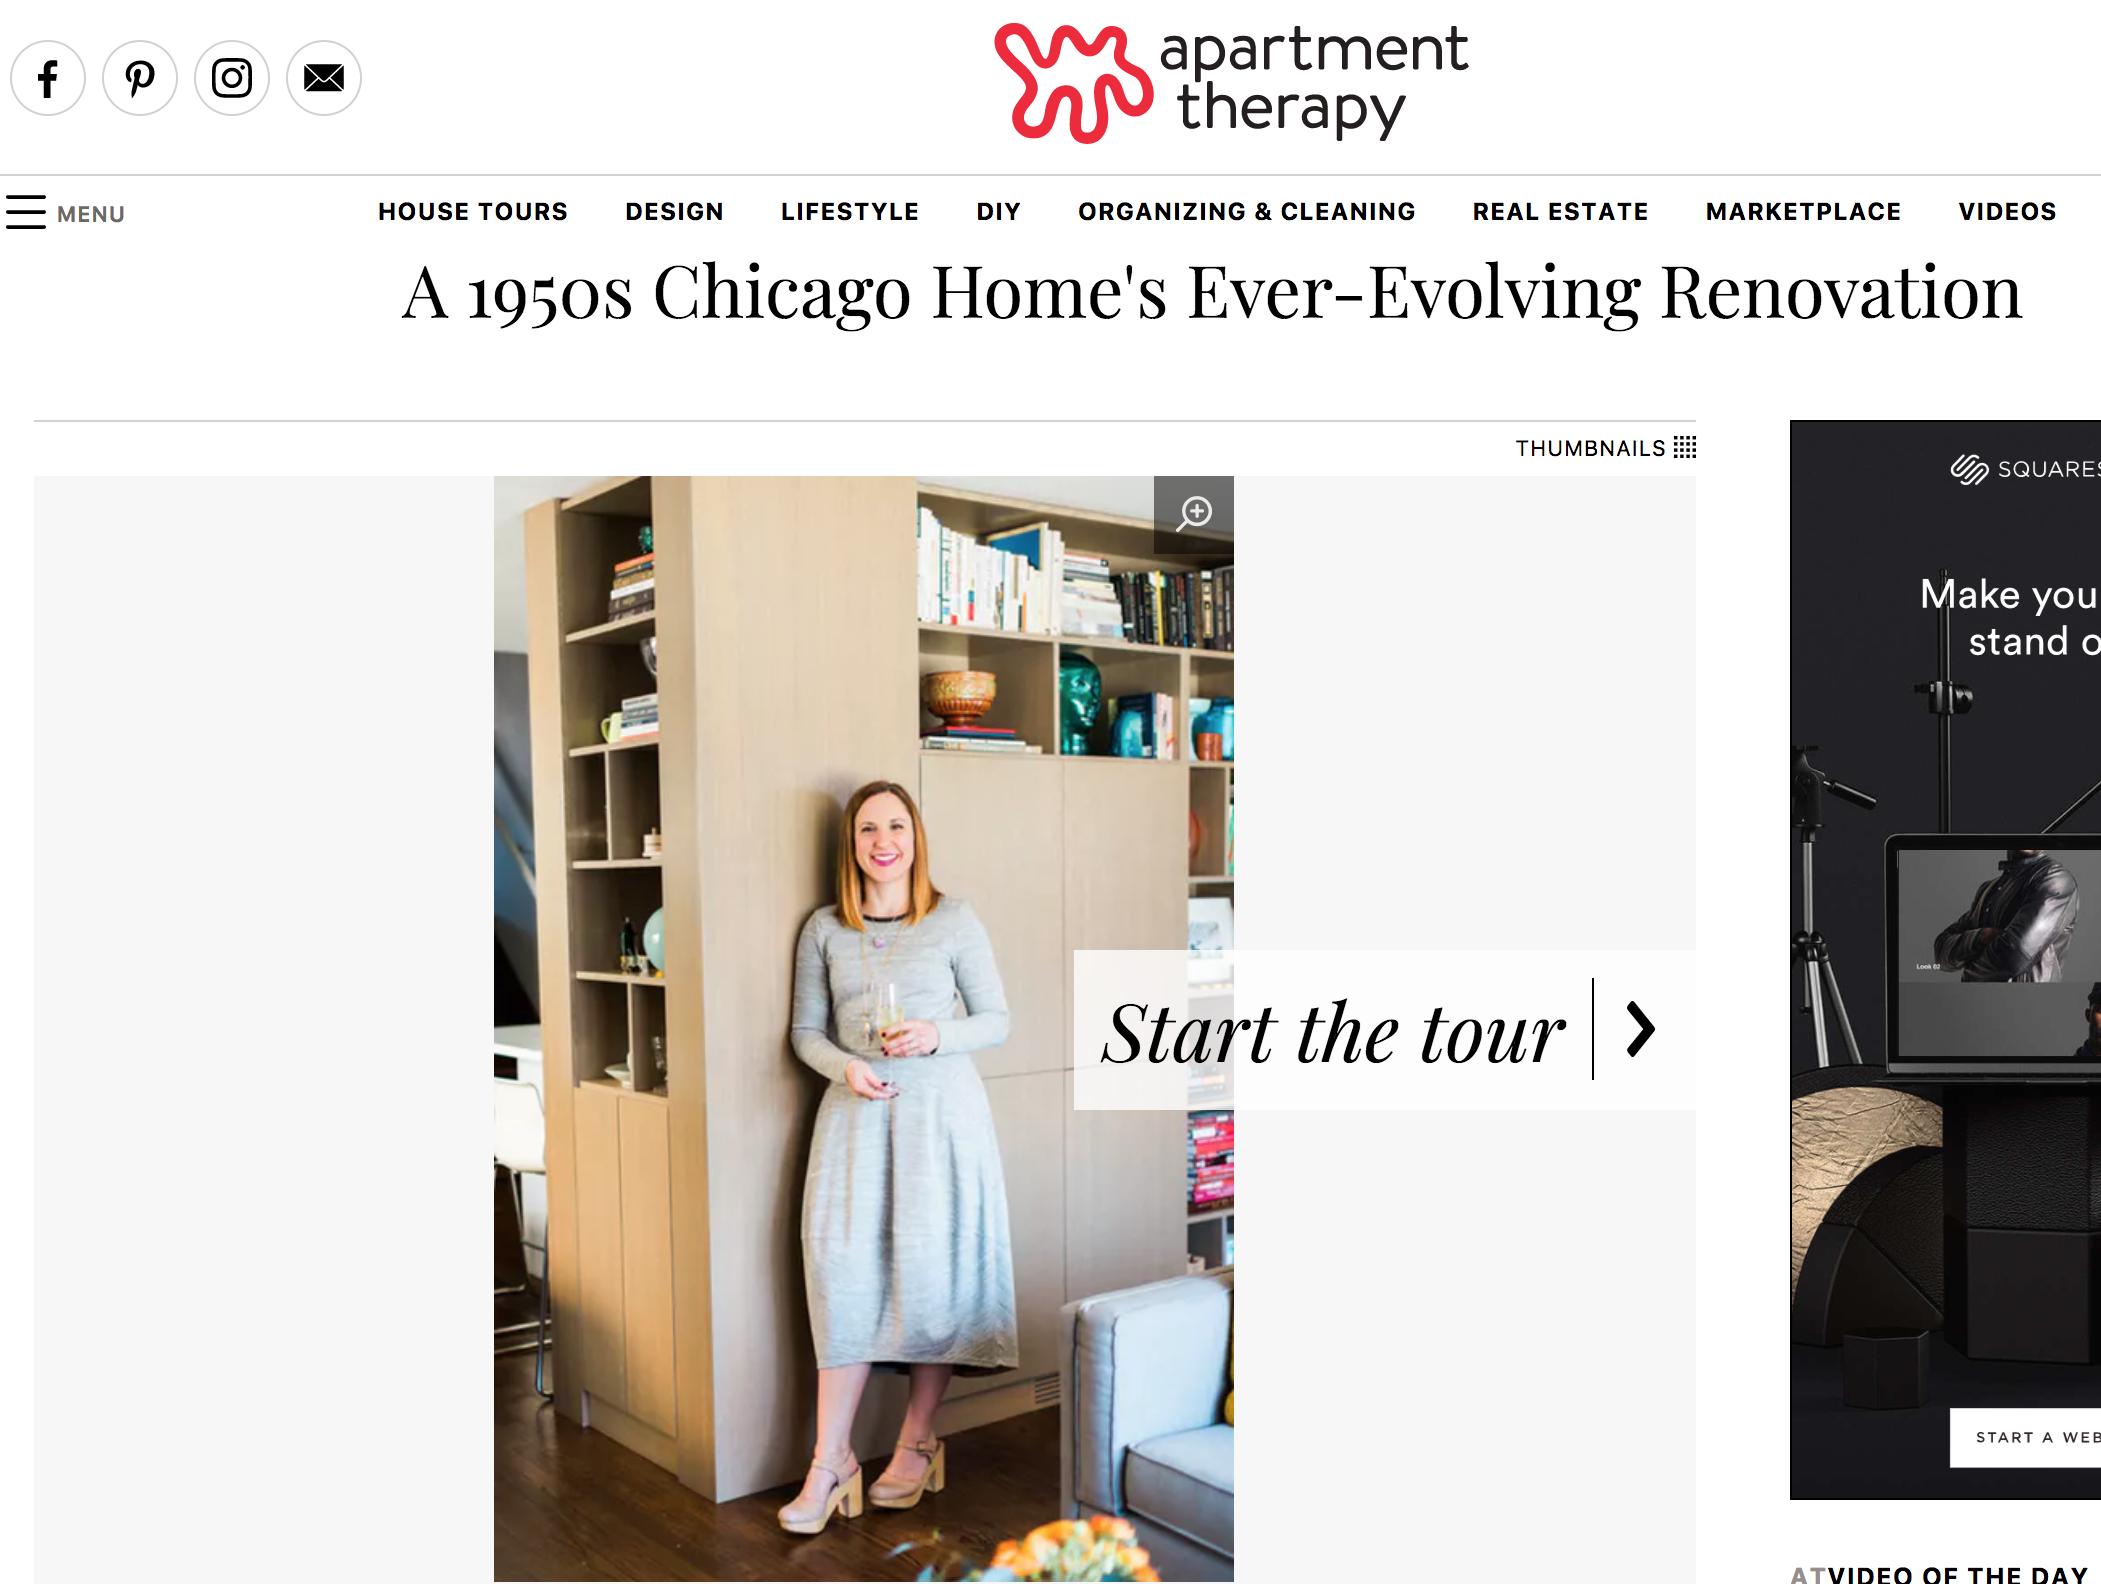 Unpatterned-HomeTour-ApartmentTherapy_InteriorDesign.jpg